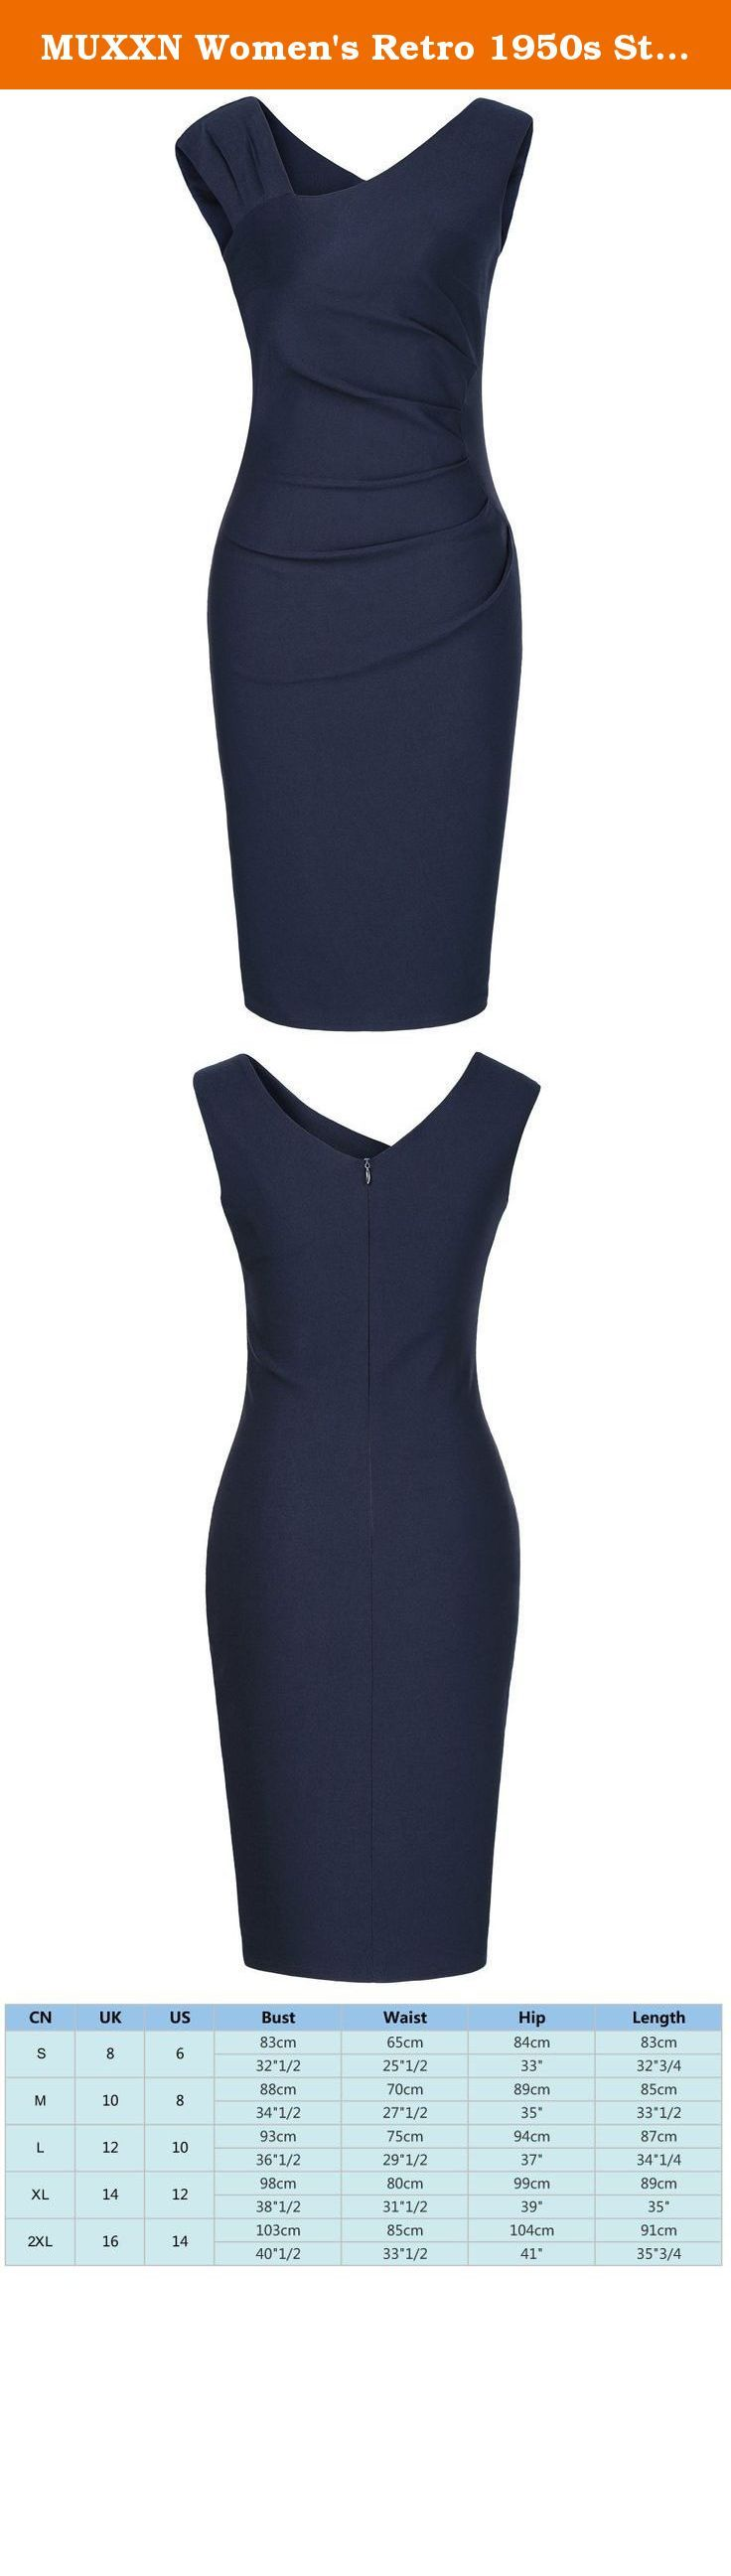 "MUXXN Women's Retro 1950s Style Sleeveless Slim Business Pencil Dress (Blue 2XL). Size Information(inch) XS: BUST- 31.75"" WAIST- 24.00"" LENGTH- 38.25"" S: BUST- 33.25"" WAIST- 25.50"" LENGTH- 38.75"" M: BUST- 35.25"" WAIST- 27.50"" LENGTH- 39.25"" L: BUST- 37.25"" WAIST- 29.50"" LENGTH- 40.25"" XL: BUST- 39.25"" WAIST- 31.50"" LENGTH- 40.75"" 2XL: BUST- 41.25"" WAIST- 33.50"" LENGTH- 41.25"" 3XL: BUST- 43.25"" WAIST- 35.50"" LENGTH- 41.75"" Size Information(cm) XS: BUST- 80cm WAIST- 61cm LENGTH- 97cm S…"